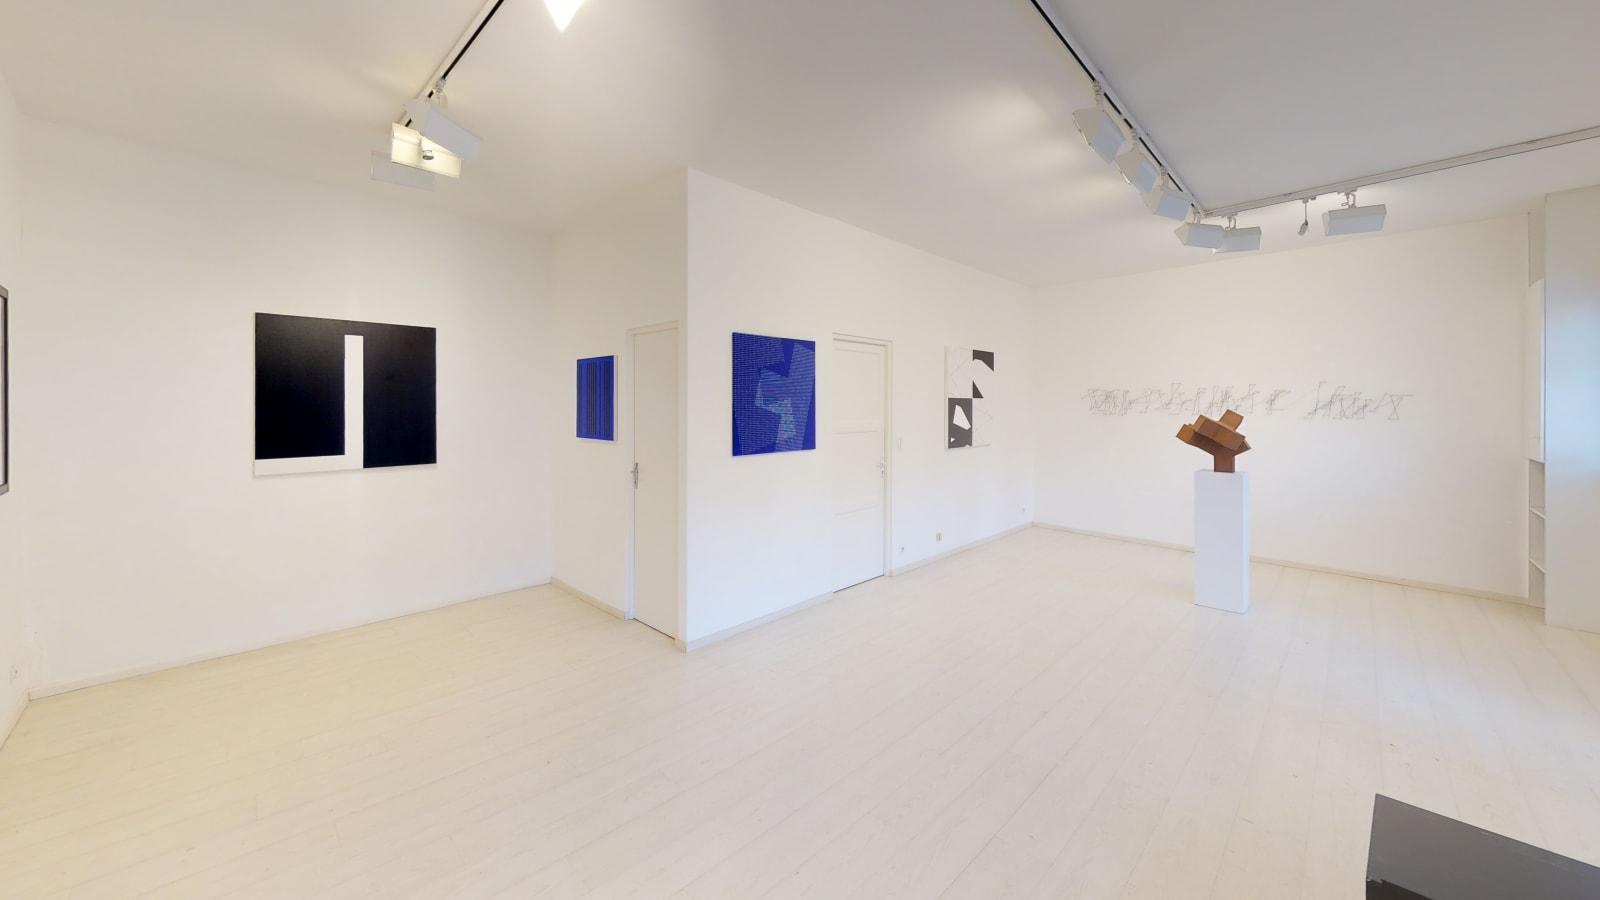 Julie Knifer, Marie-Thérèse Vacossin, François Morellet, Norman Dilworth & Vera Molnar / exposition de groupe Vera Molnar & Friends / Oniris 2019